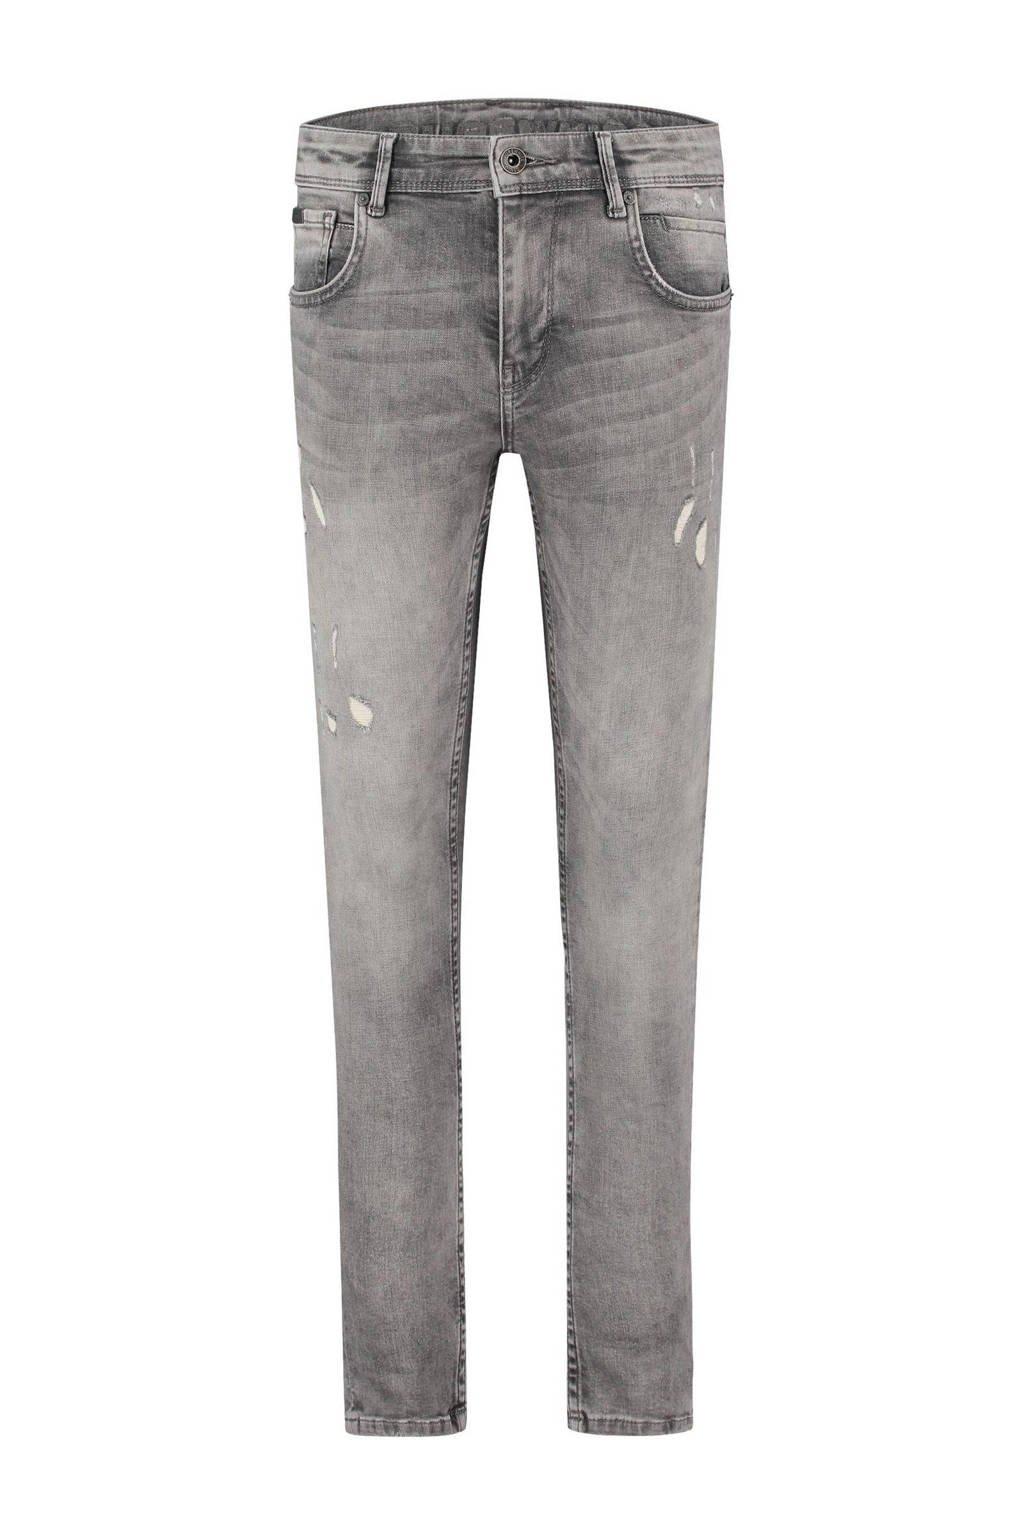 Ballin skinny jeans The Diago denim light grey, Denim Light Grey